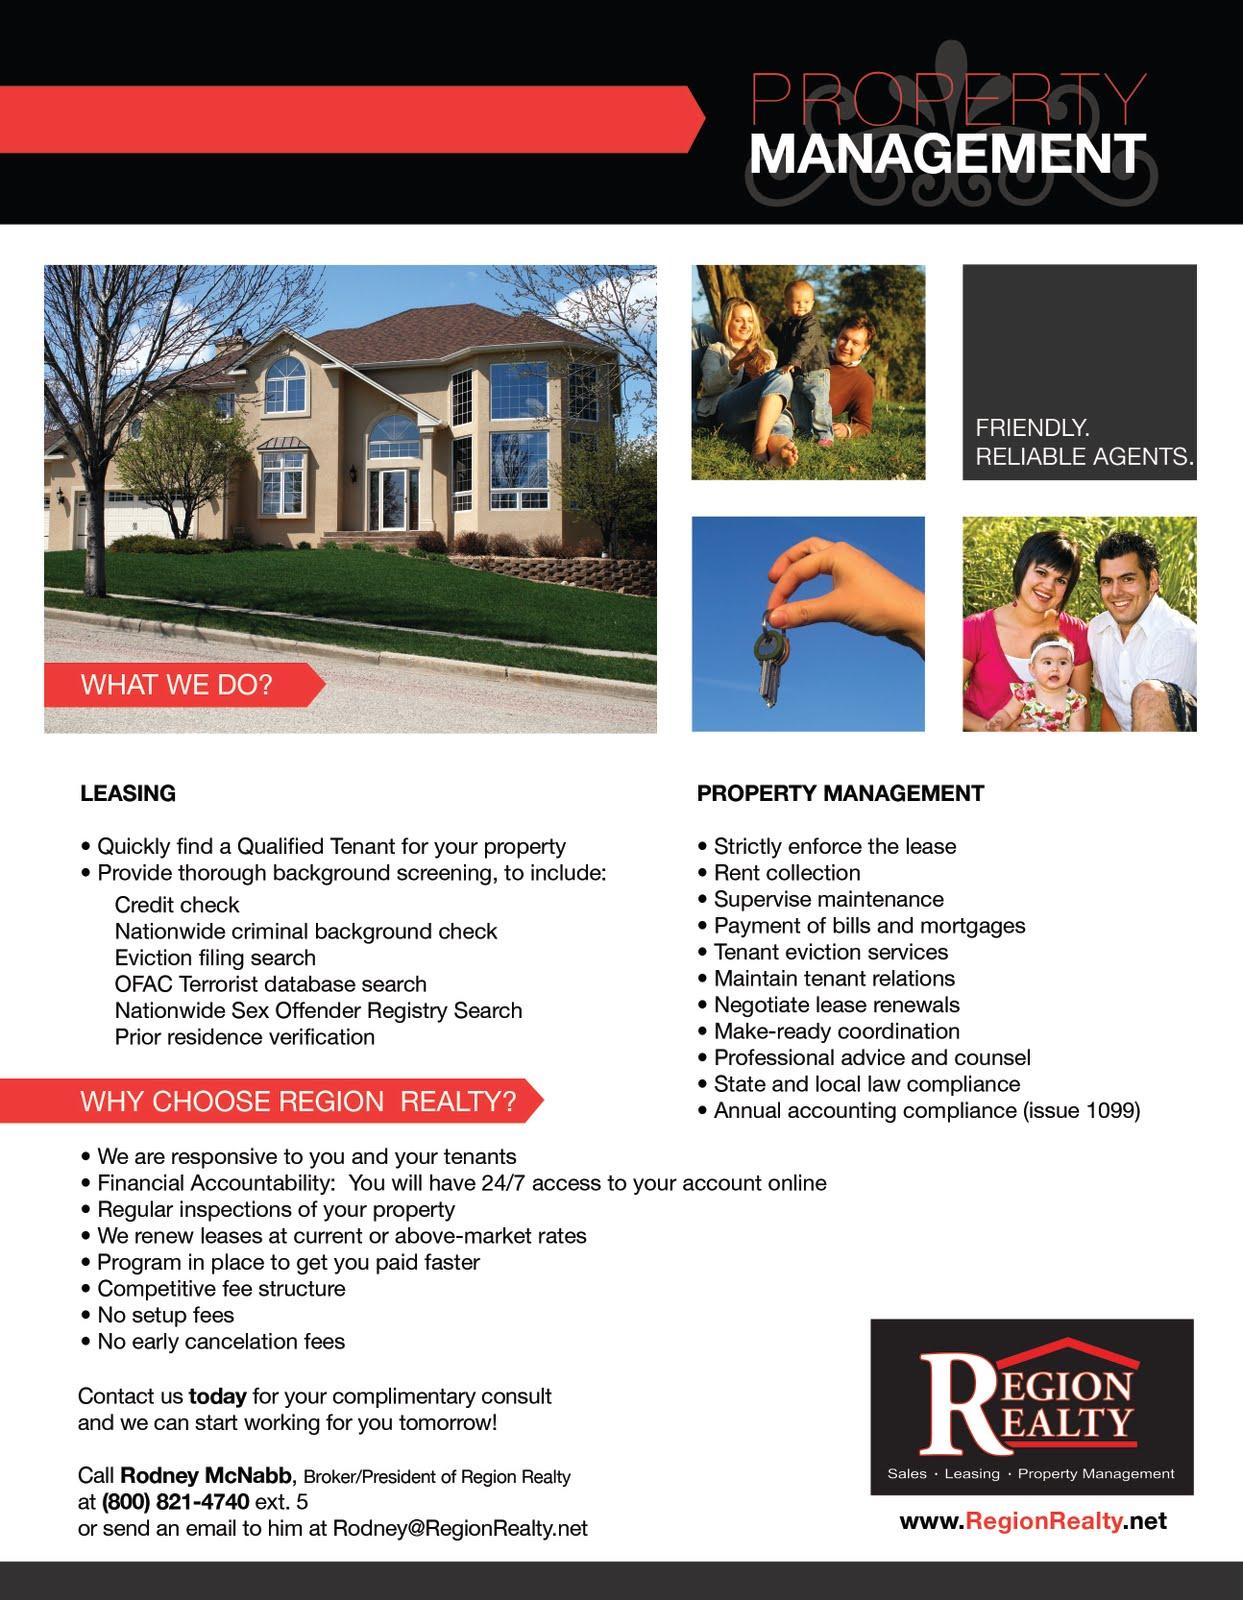 Monnerk Design Region Realty Property Management FlyerRockwall TX - Property management brochure templates